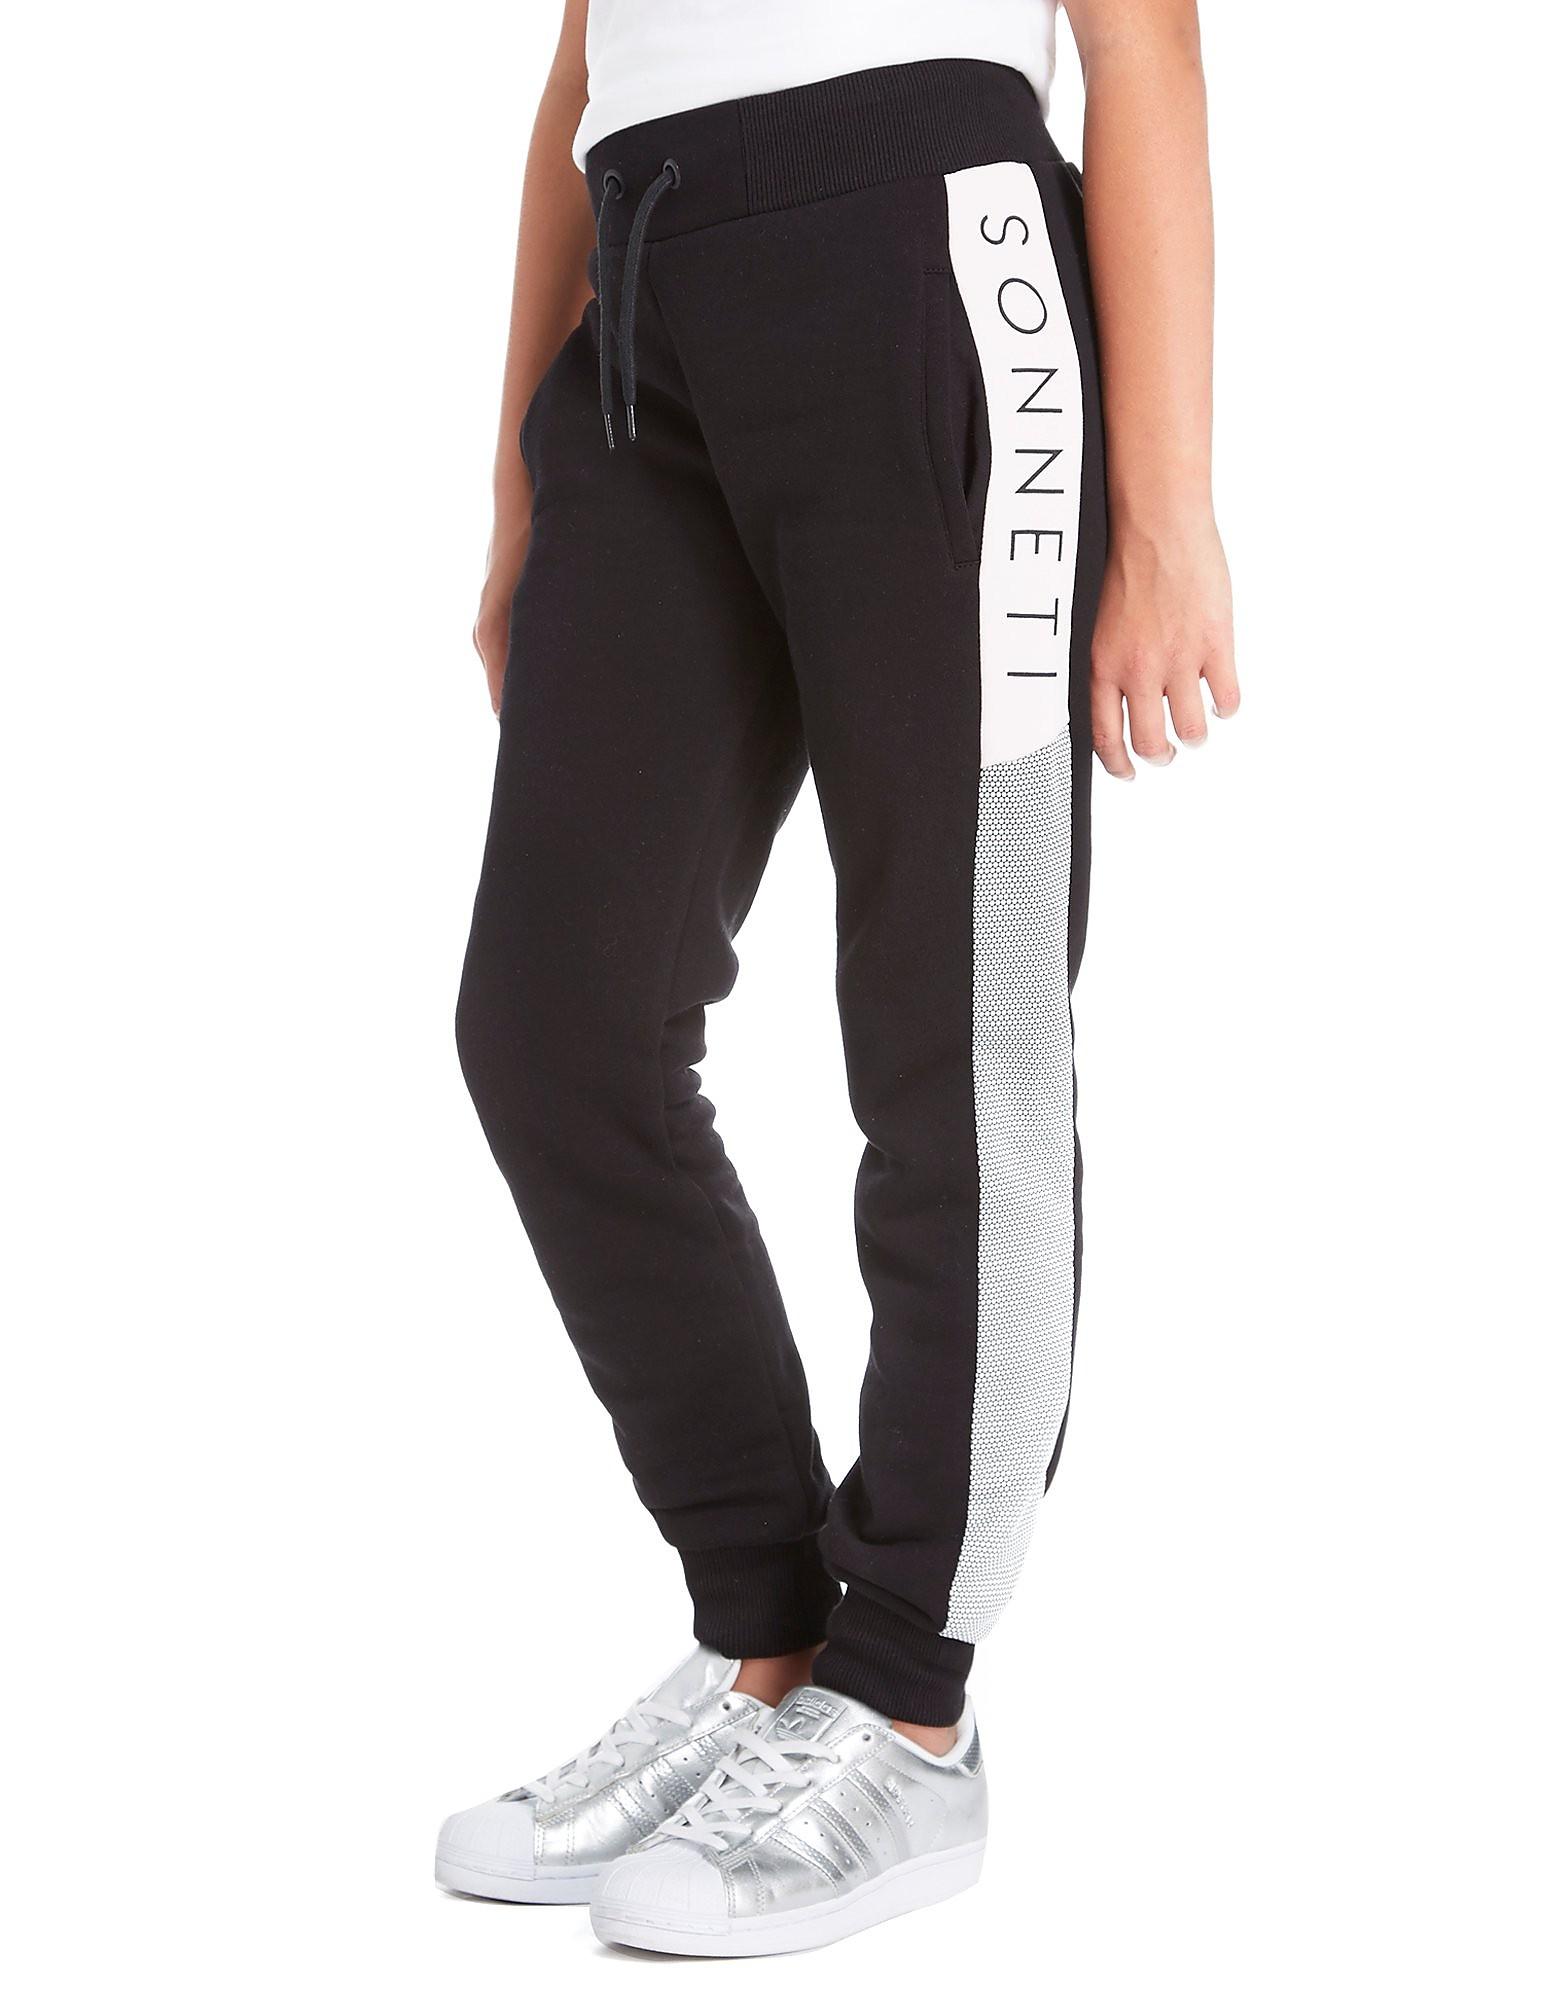 Sonneti Girls' Blocker Jogging Pants Junior